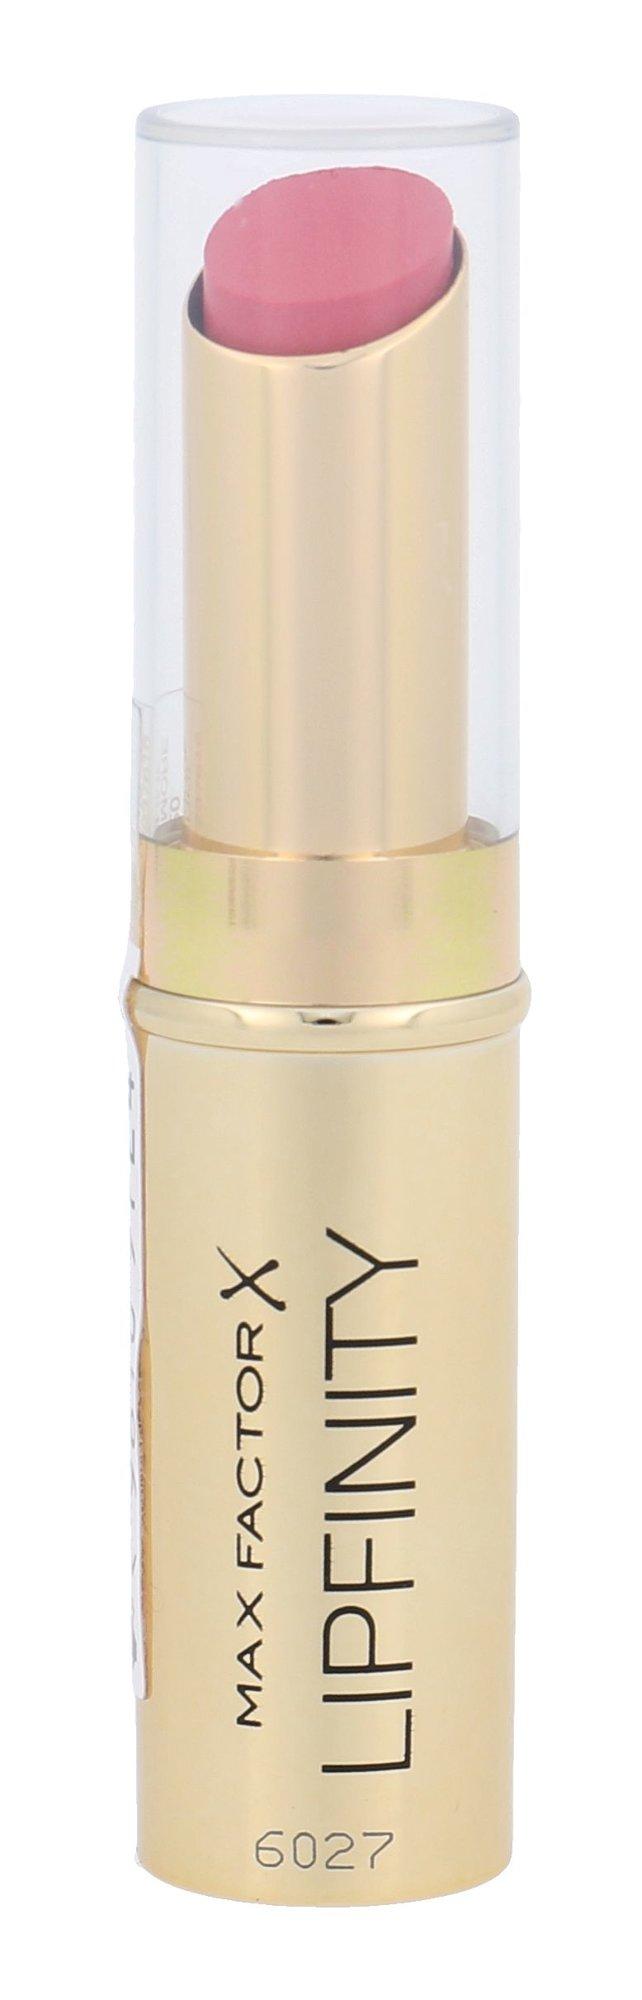 Max Factor Lipfinity Cosmetic 3,4ml 20 Evermore Sublime